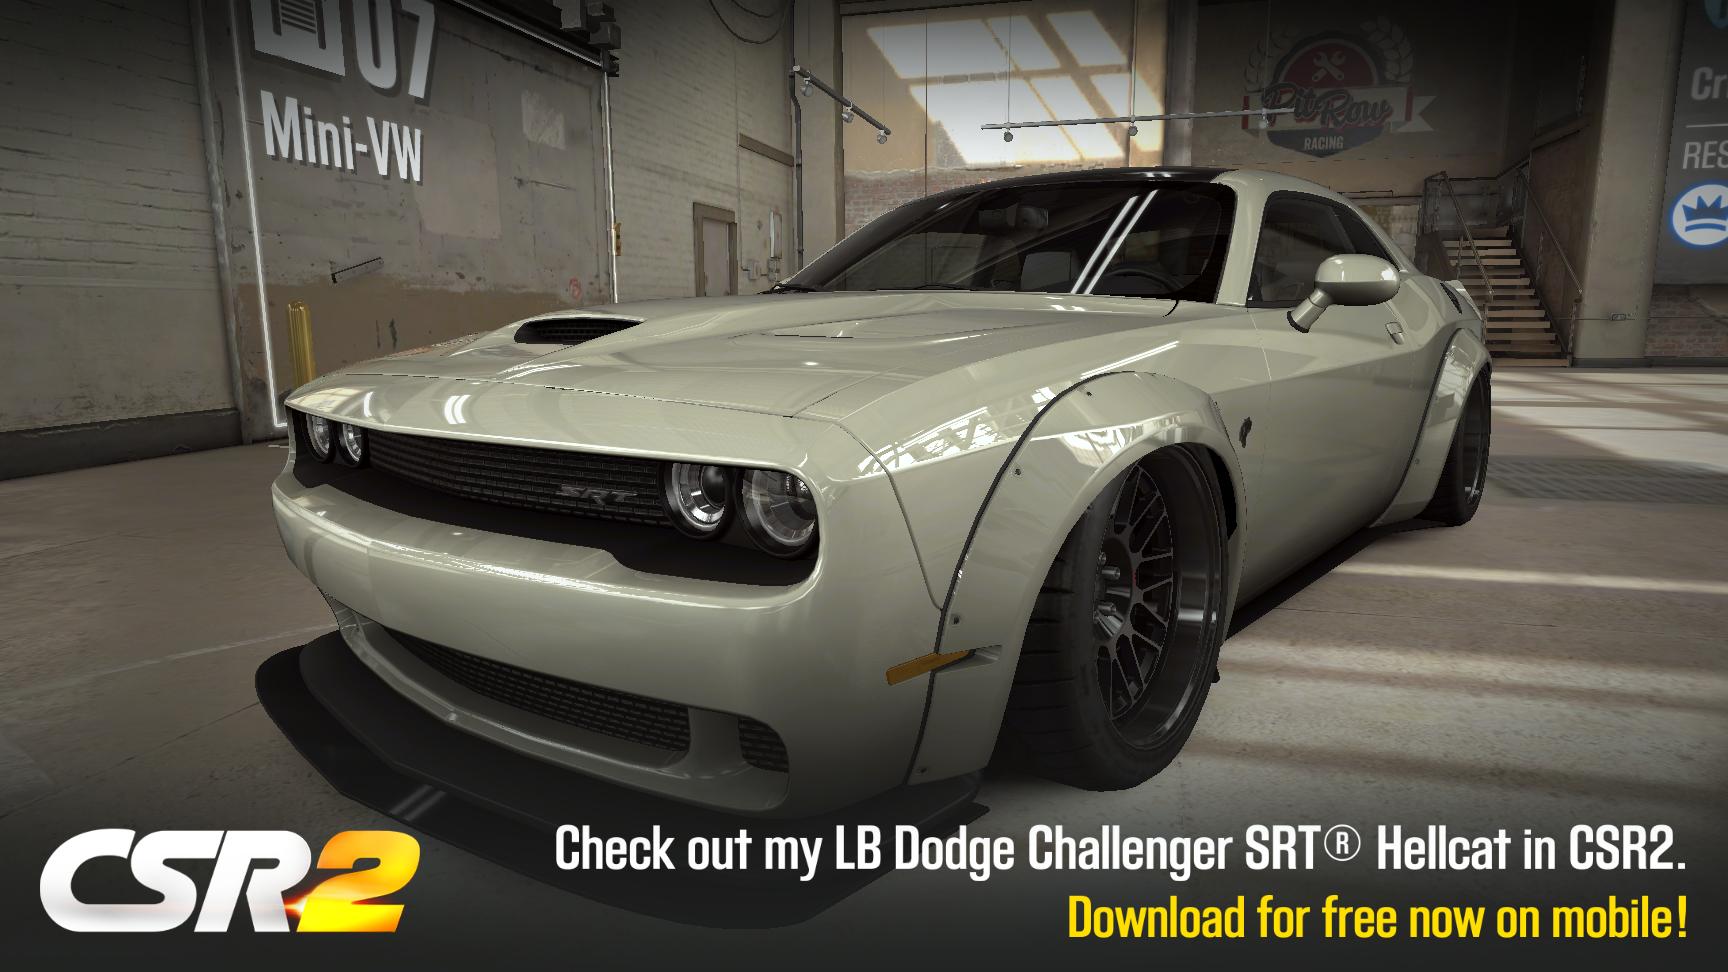 Impala 2009 chevy impala body kit : My CSR Racing franchise car #50: LB #Dodge Challenger SRT Hellcat ...